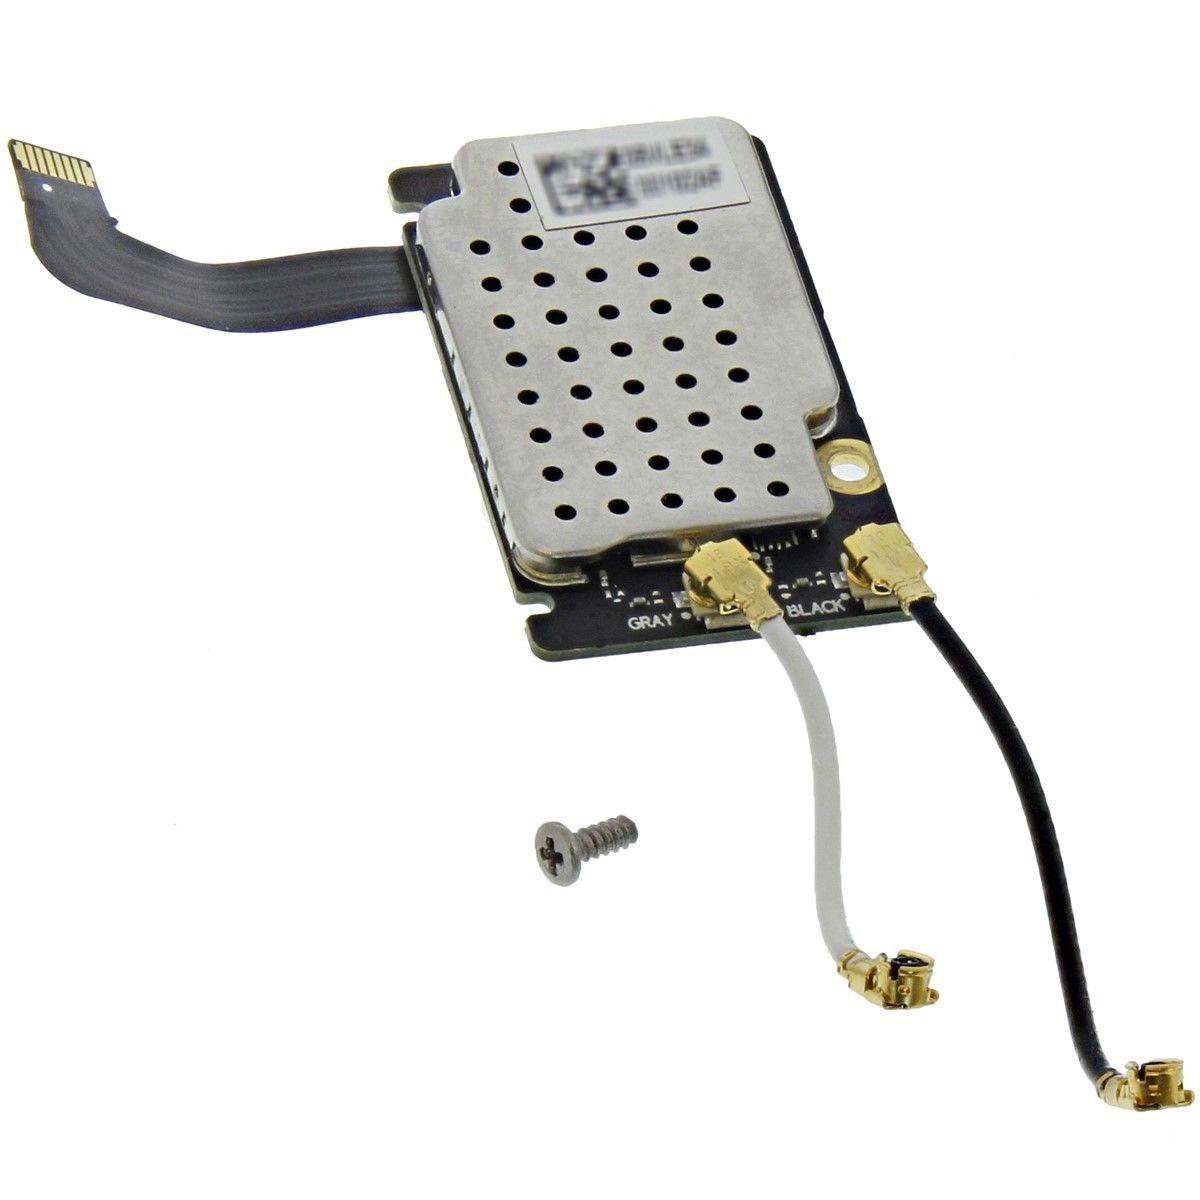 Genuine NEW DJI Mavic Pro Wifi Board Module (GKAS) - Spare Replacement Part